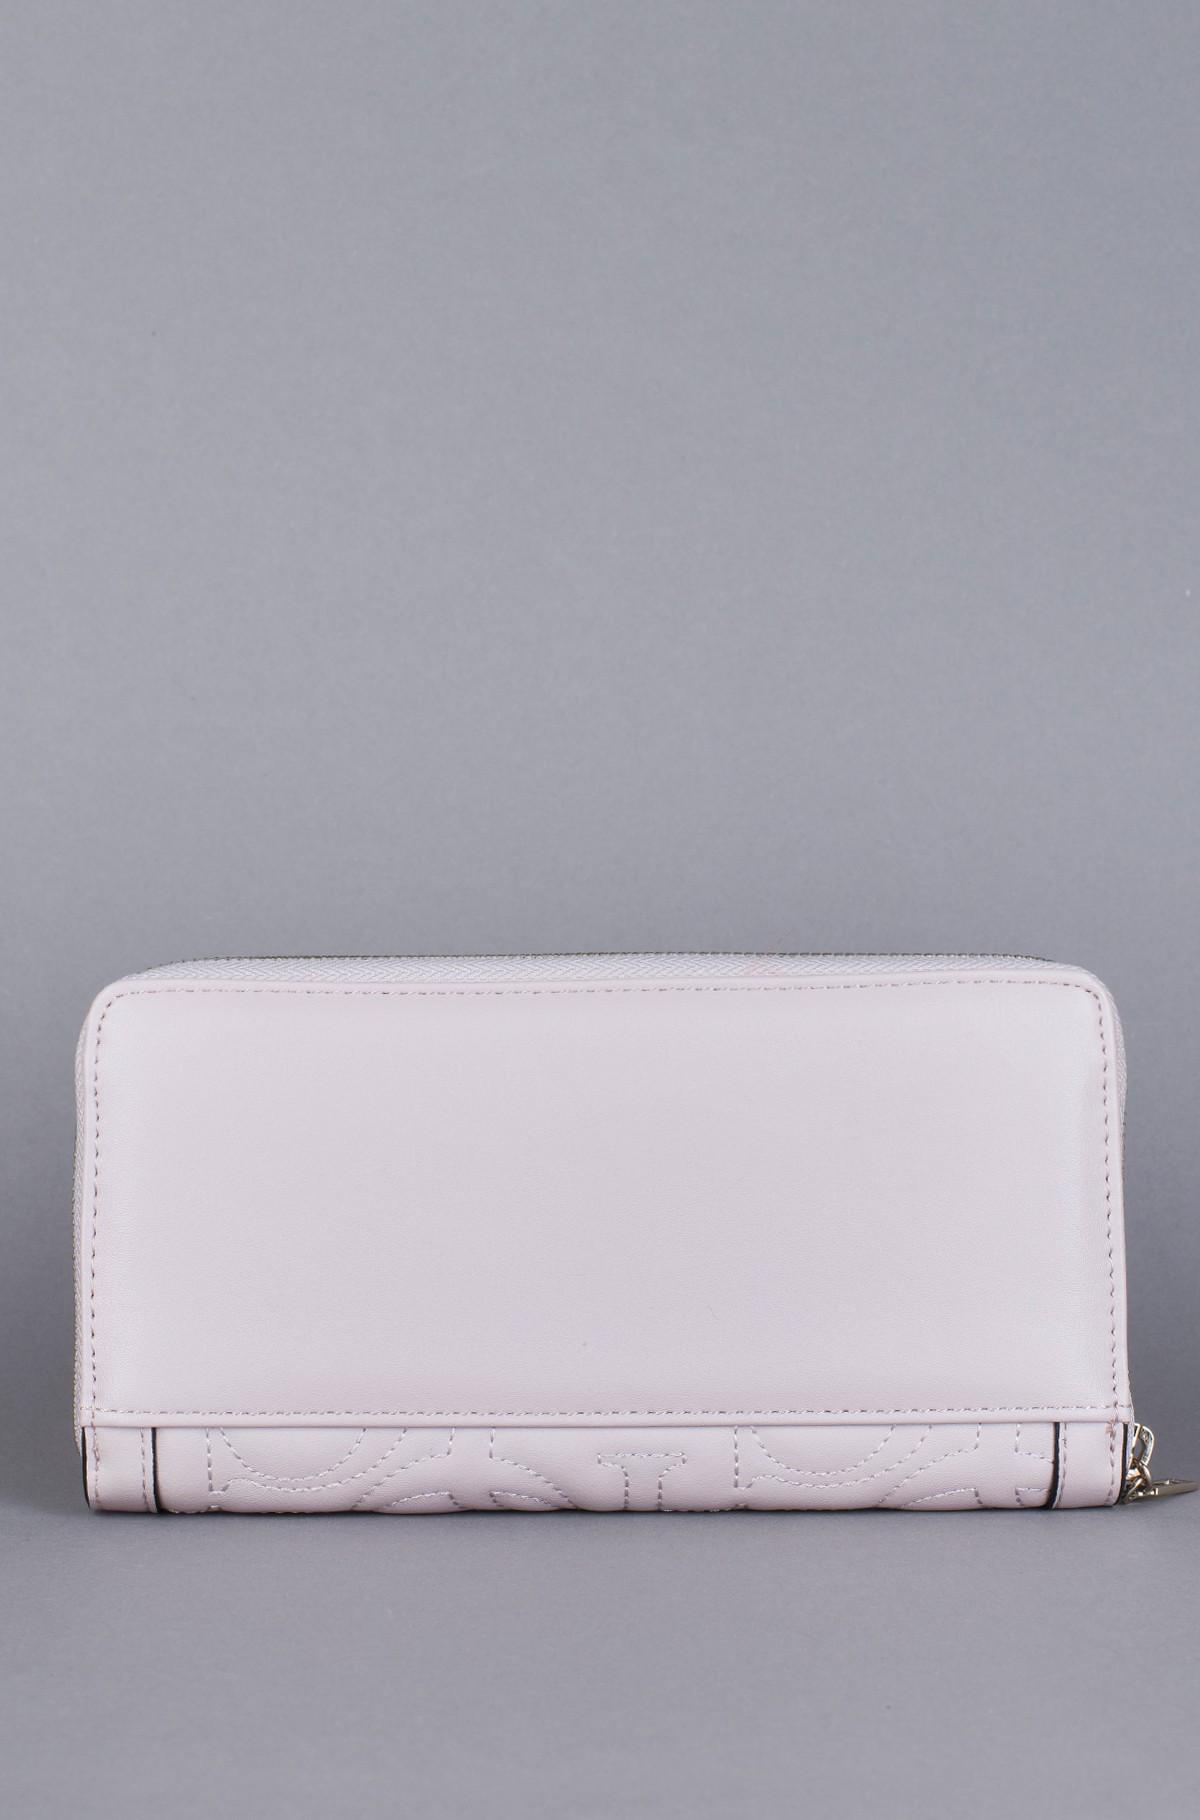 Wallet SWVG74 75630-full-2